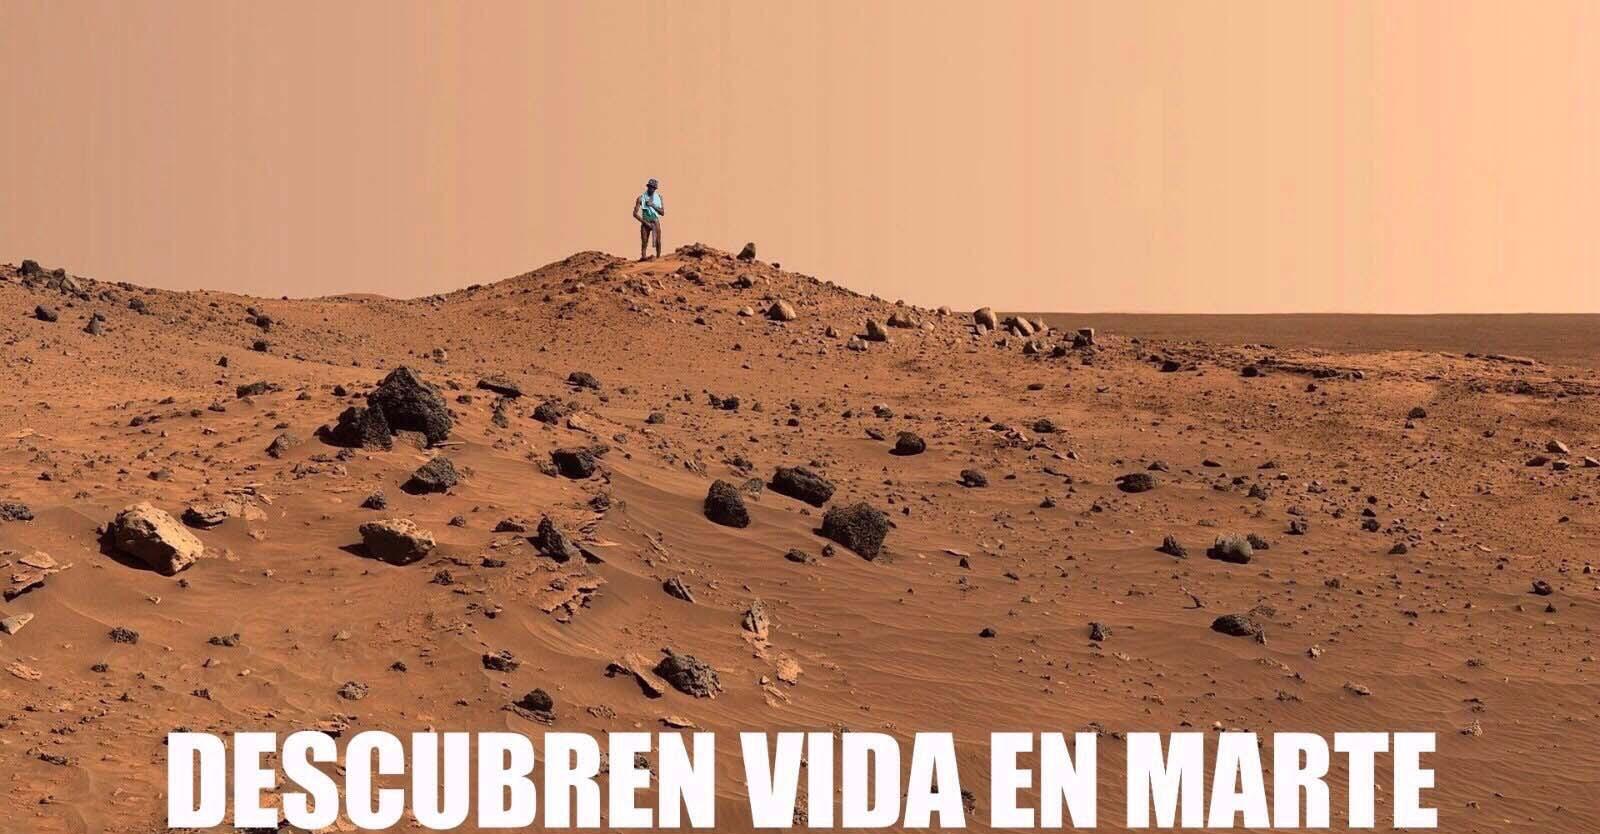 Descubren vida en Marte, era el negro del whatsapp